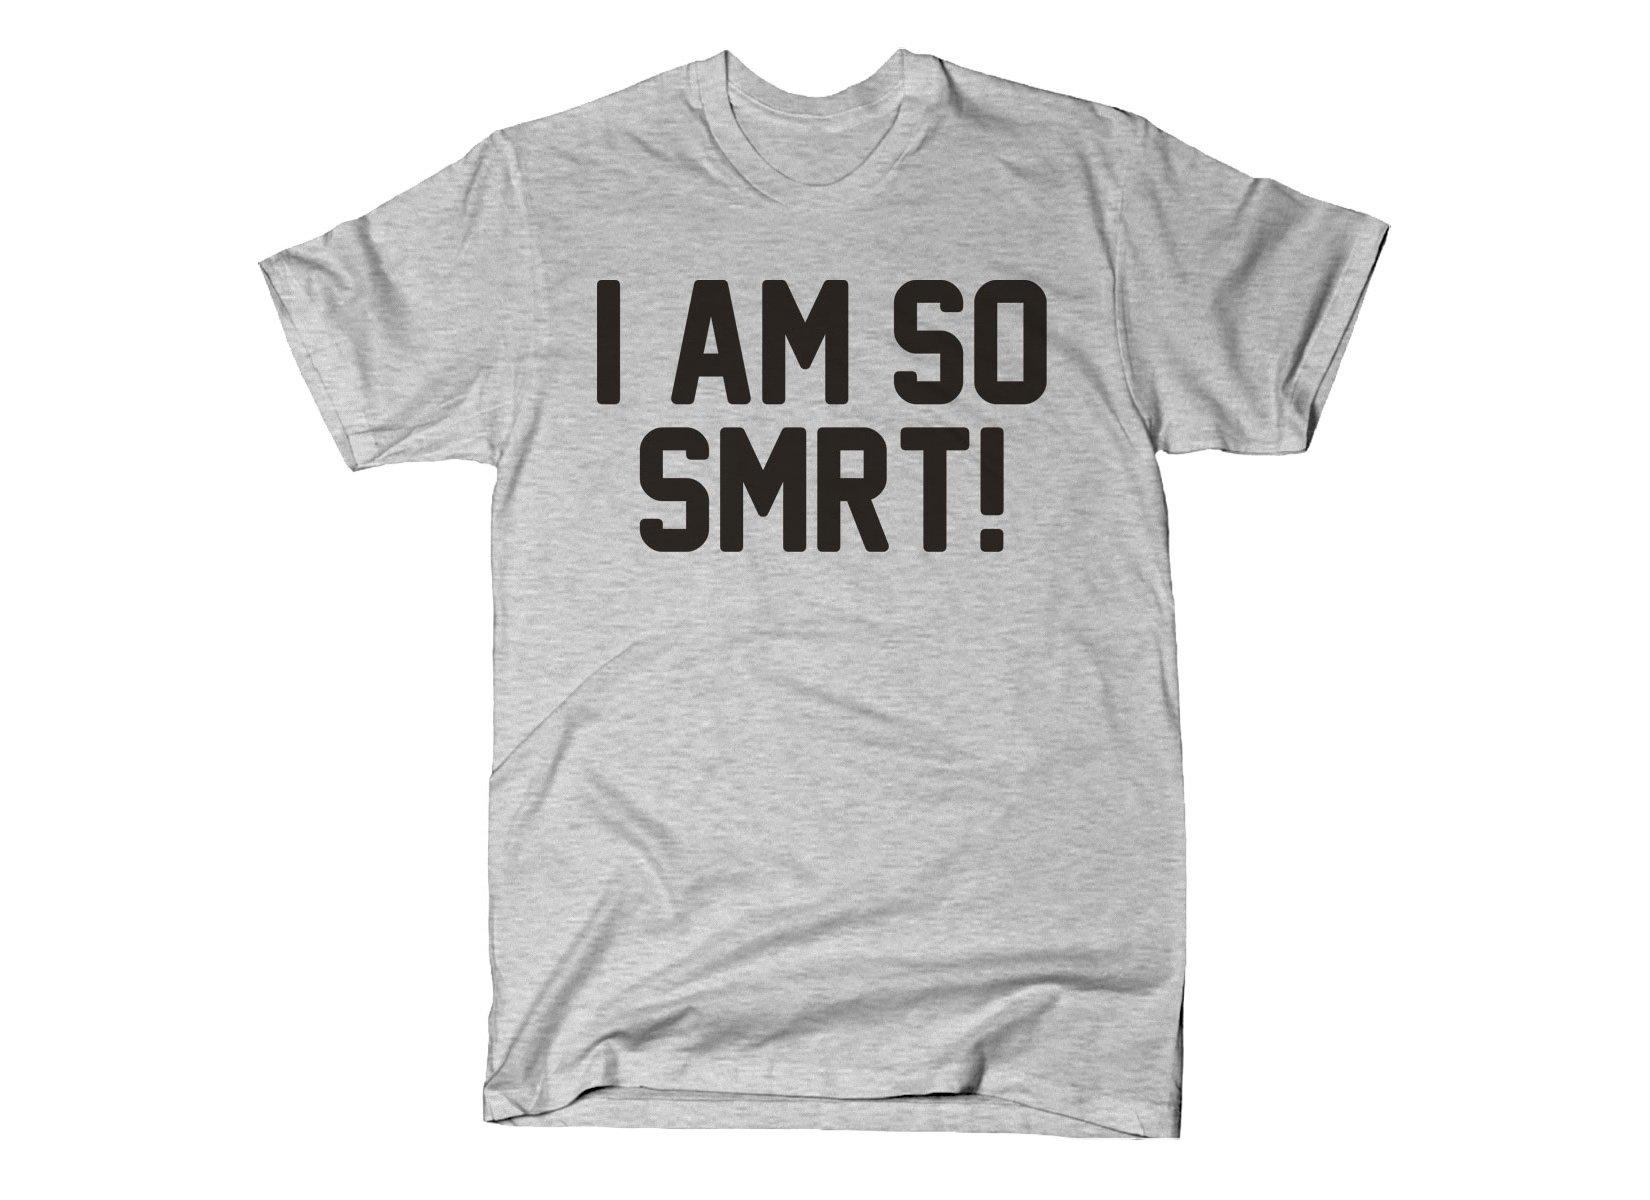 I Am So Smrt on Mens T-Shirt